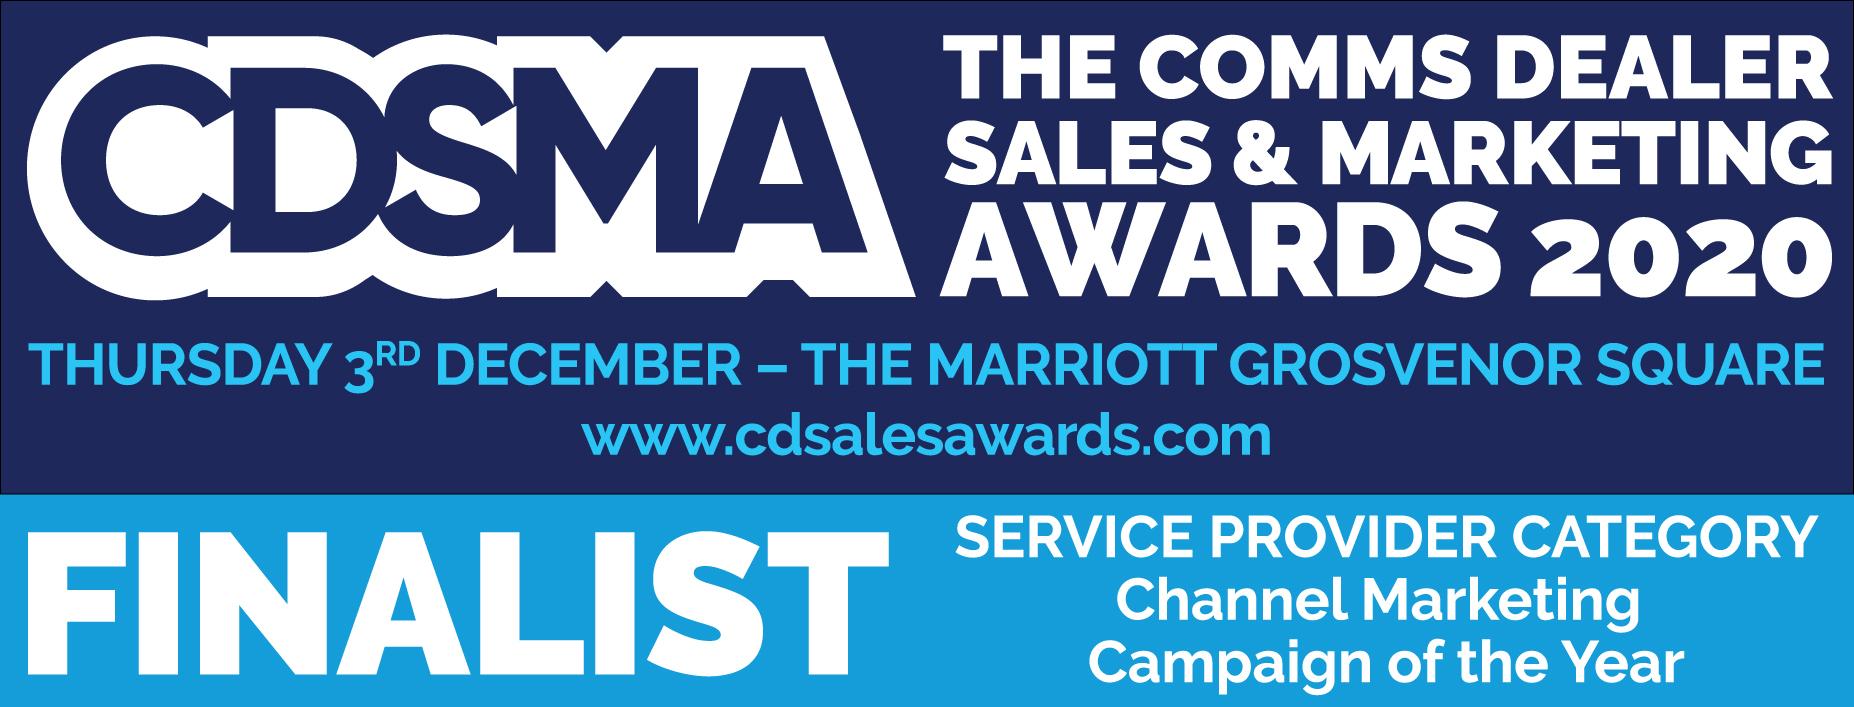 Comms Dealer Sales & Marketing Awards 2020